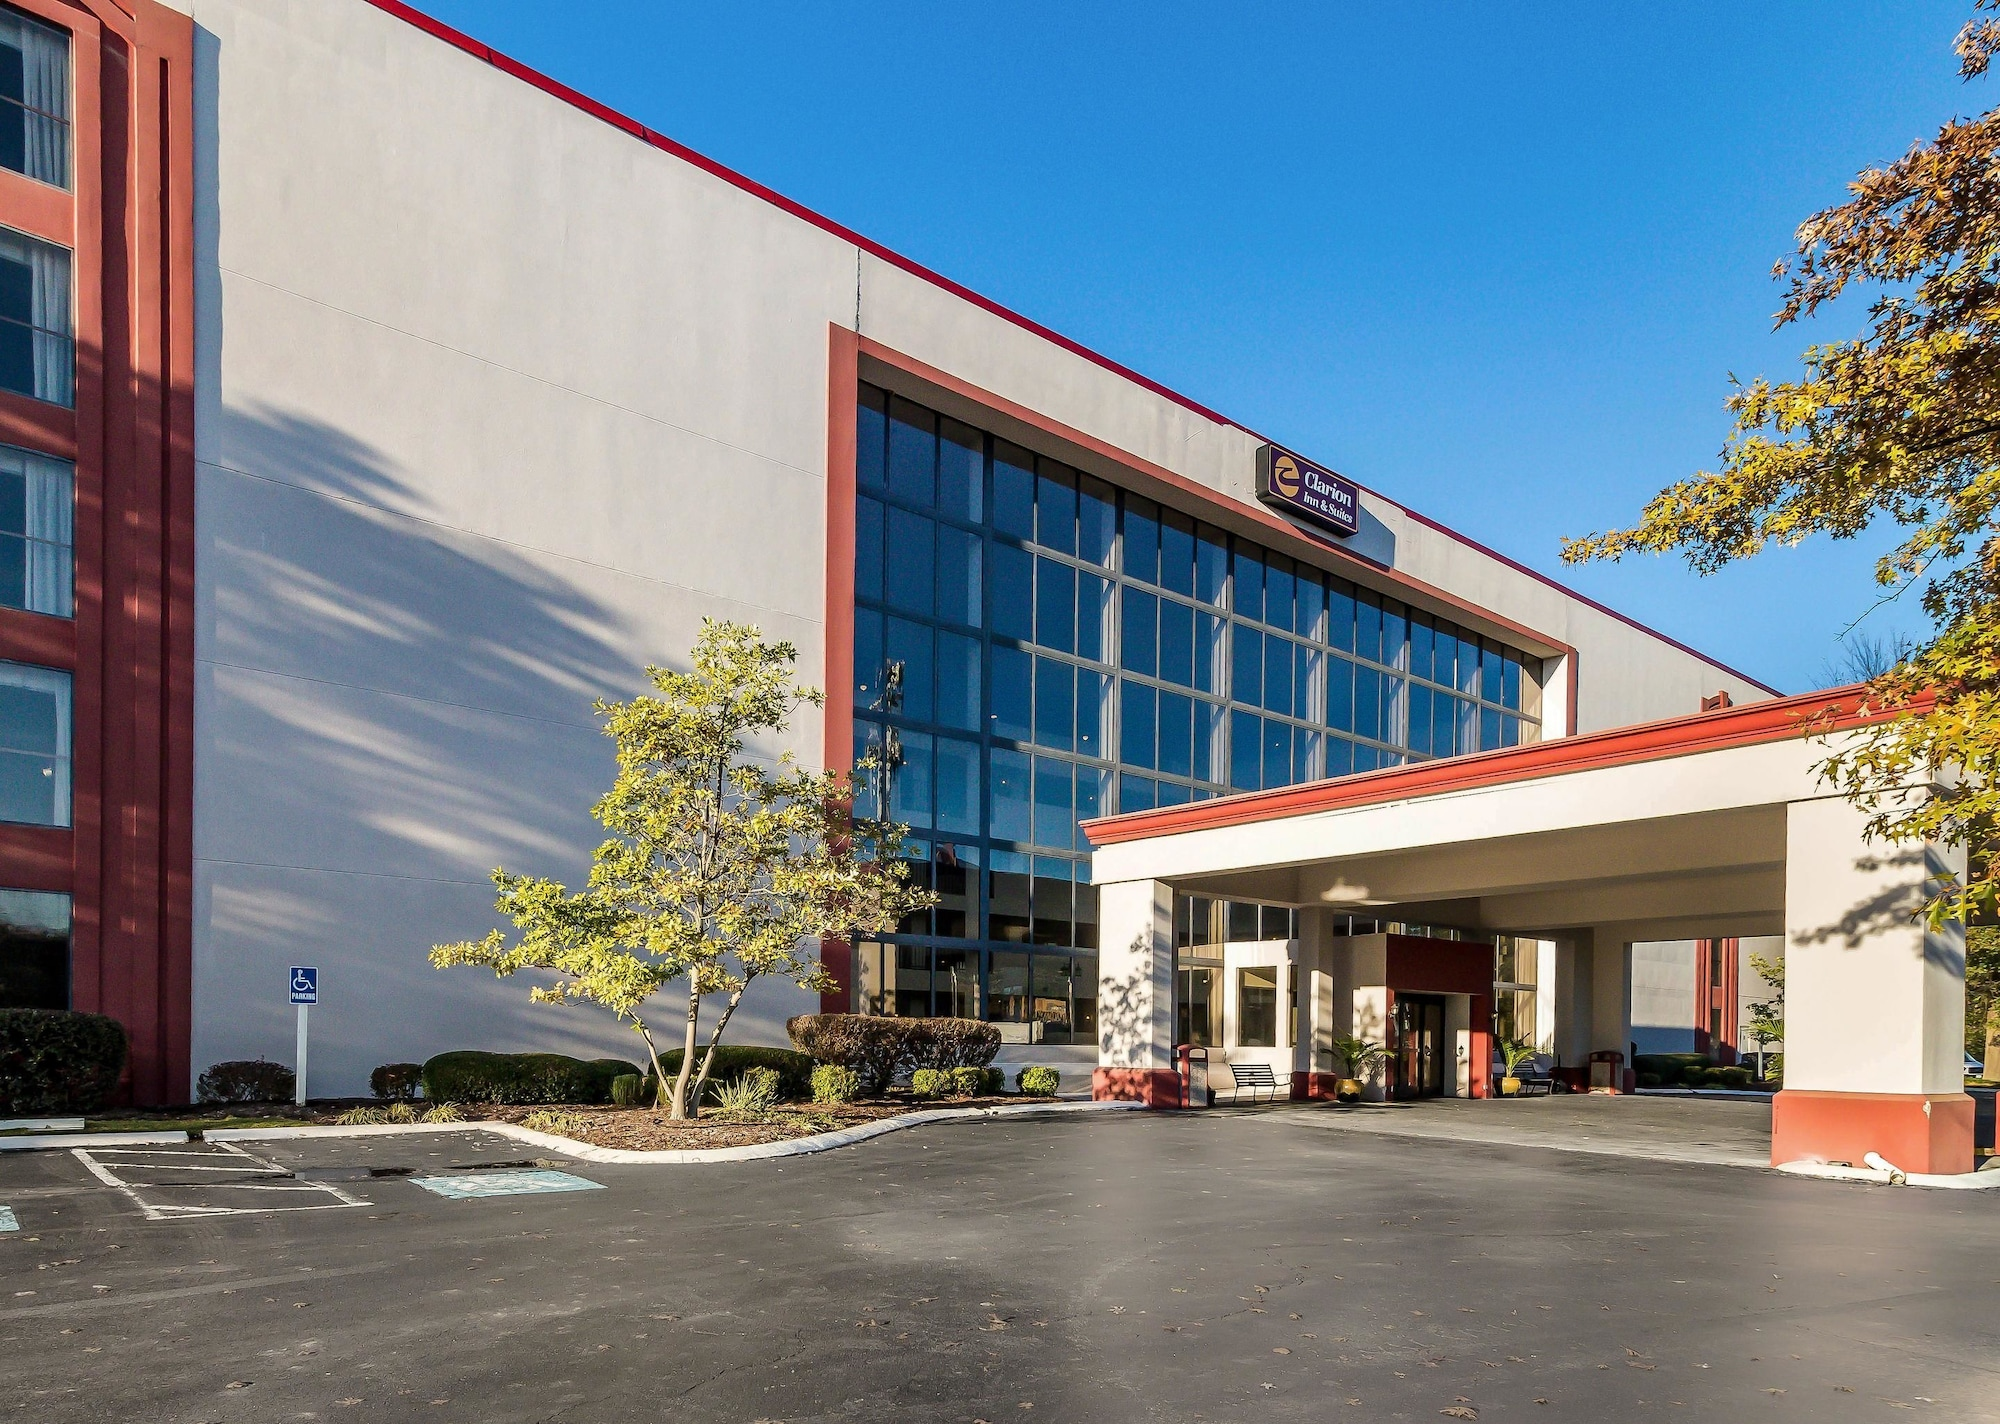 Clarion Hotel Convention Center Jackson Northwest, Madison